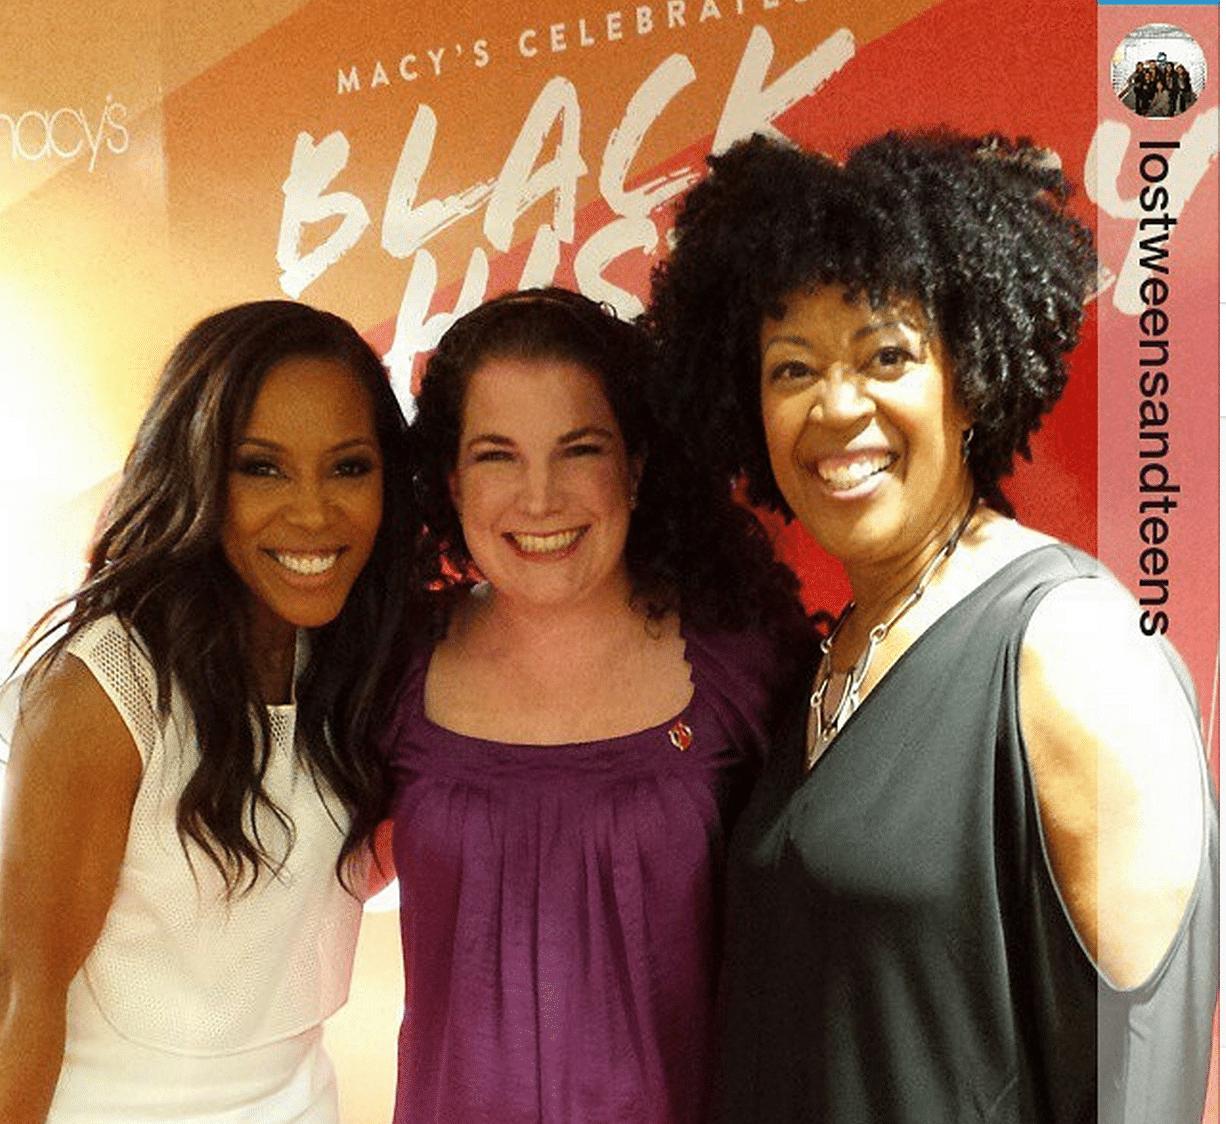 Our mom influencer Amanda Daufu with famed stylists June Ambrose & Johnetta Boone celebrating #BlackHistoryMonth and the evolution of #fashion at Macys.